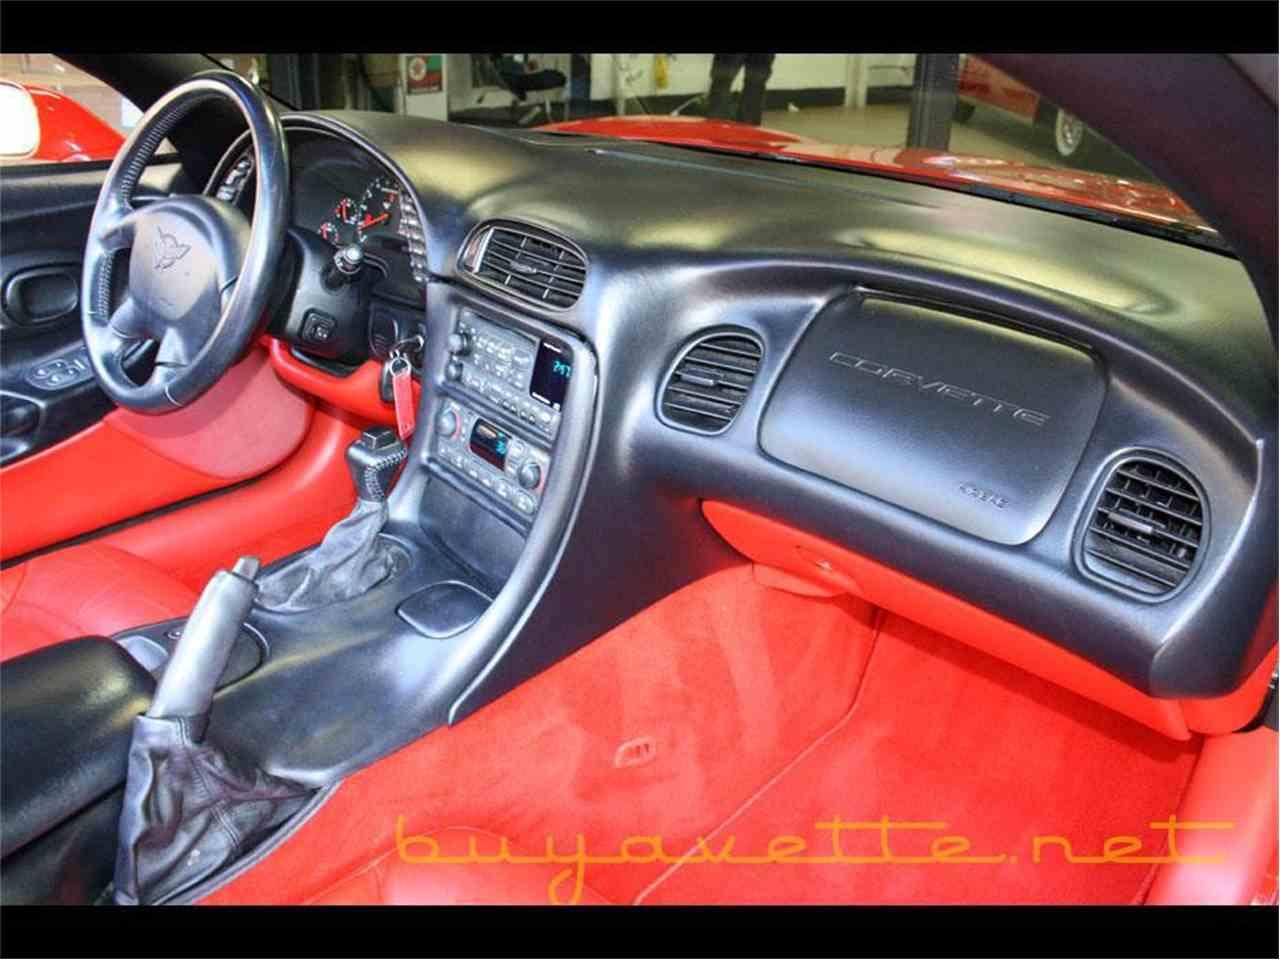 Large Picture of 2002 Chevrolet Corvette located in Georgia - $16,999.00 - MFOA